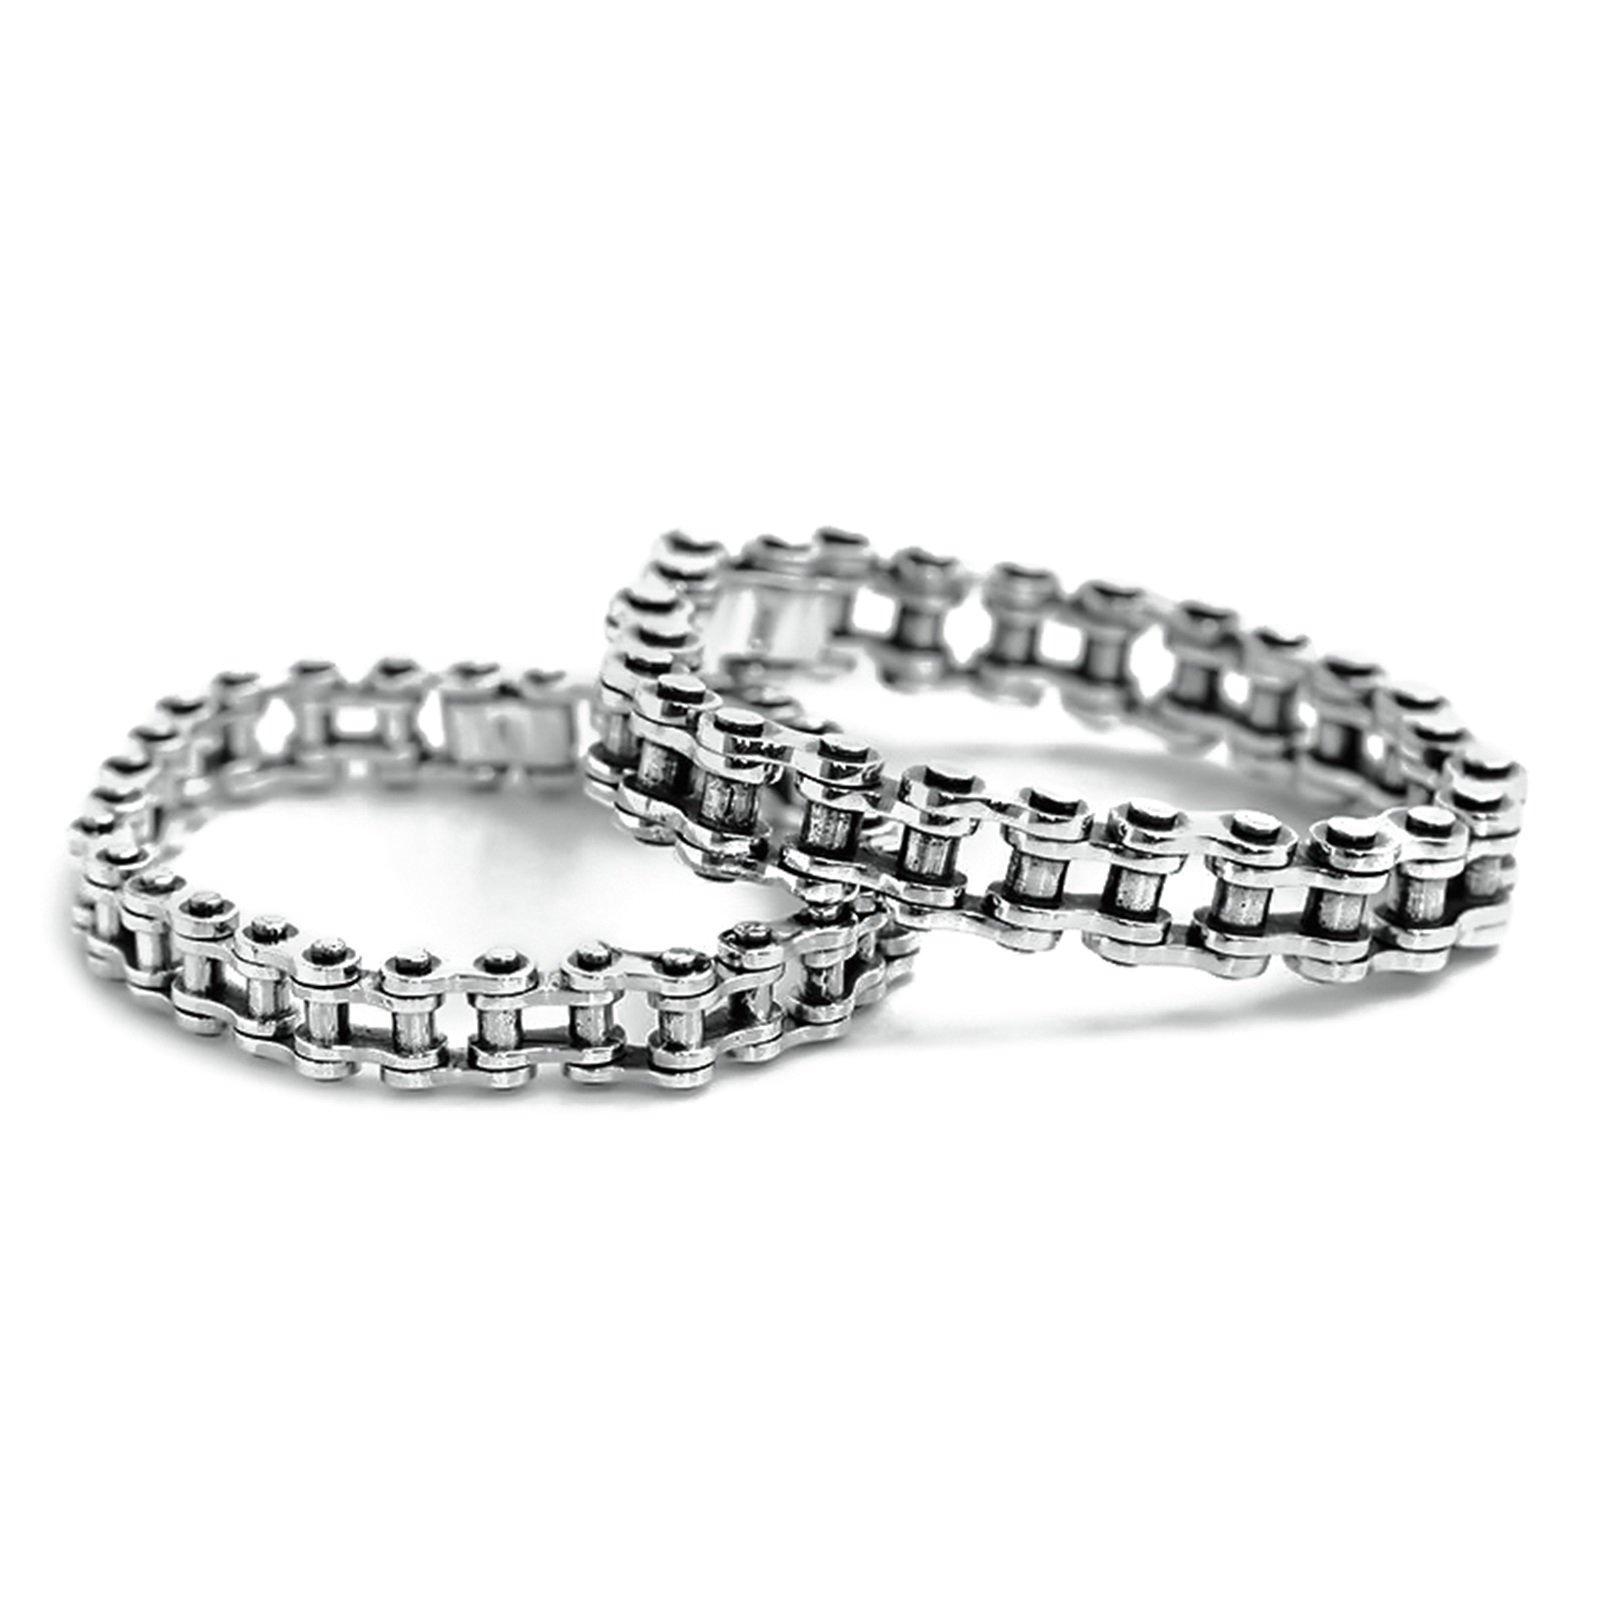 Daesar 925 Silver Bracelet For Women And Men Locomotive Chain Couple Bracelet Silver Chain Length:19CM